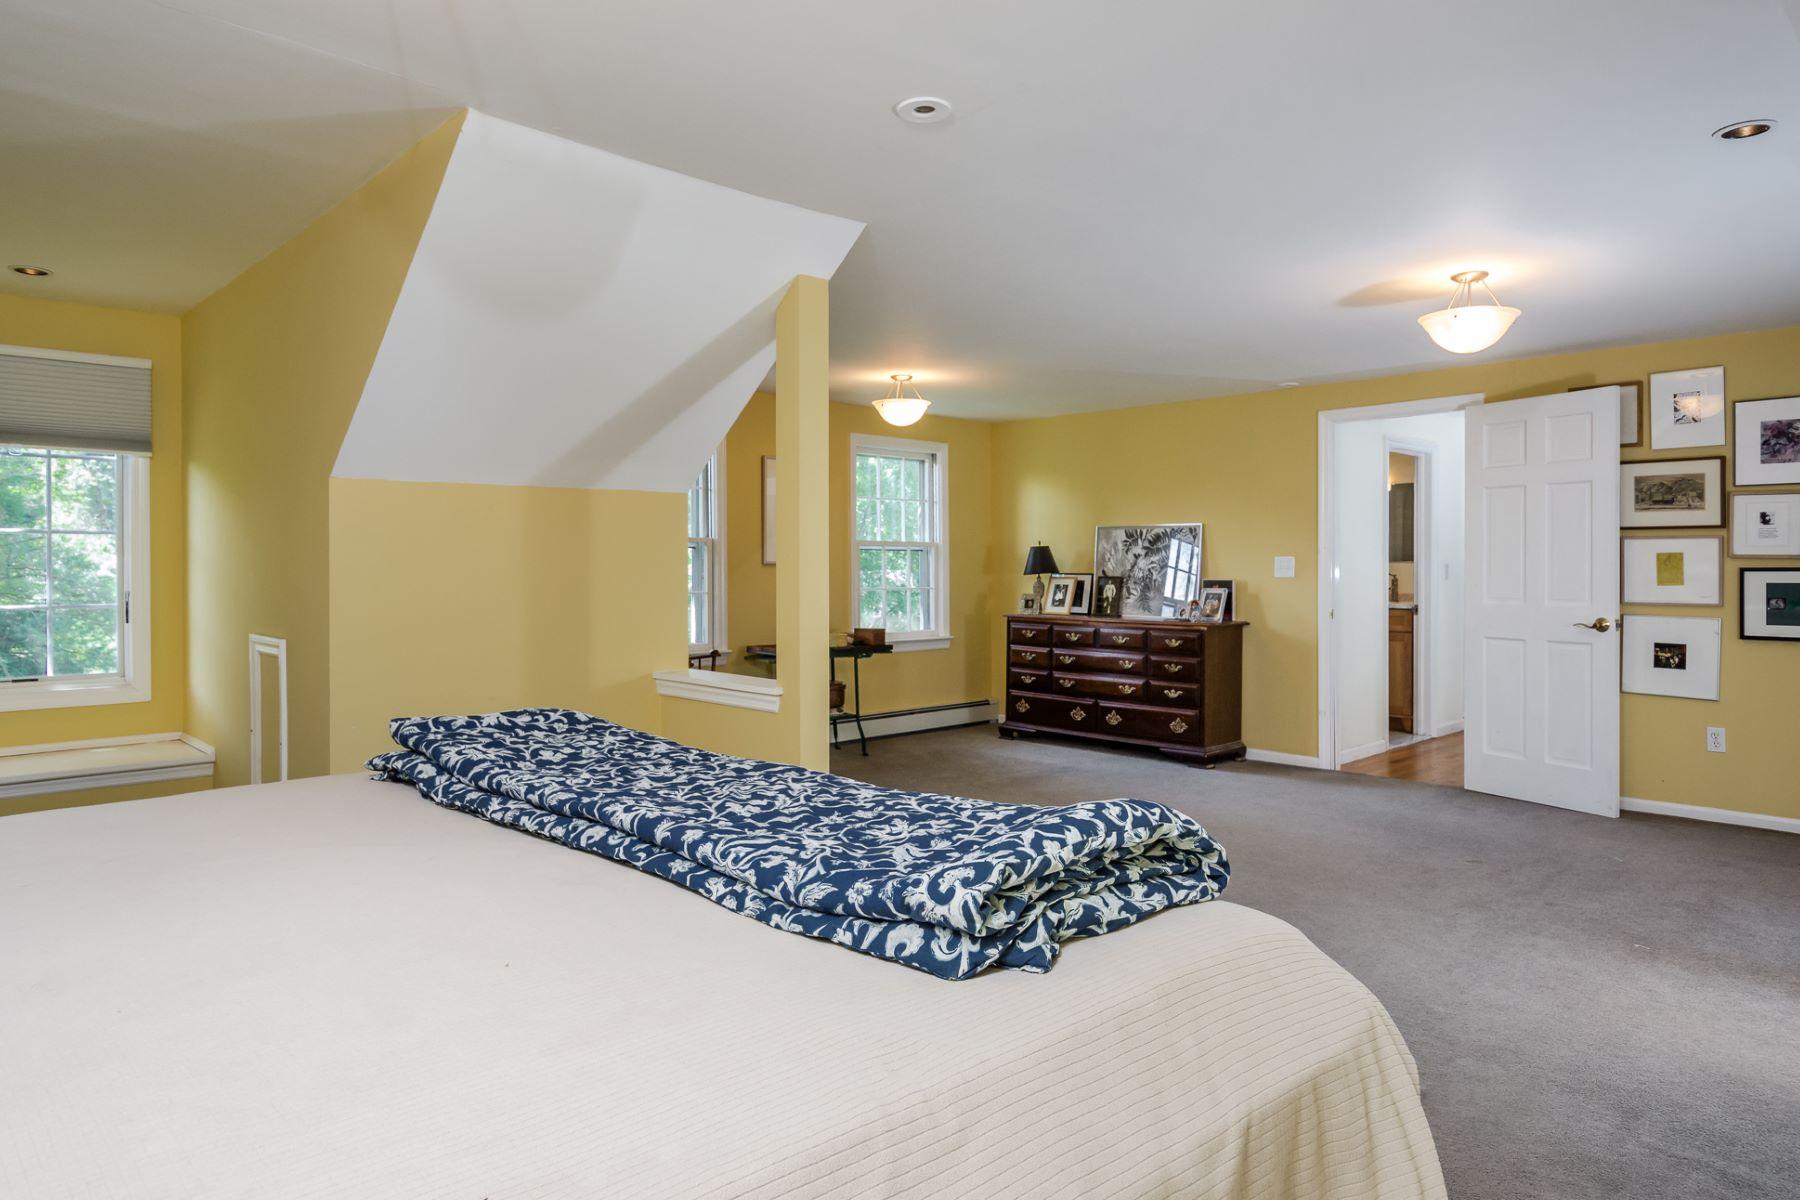 Additional photo for property listing at Engaging Design - Hopewell Township 1181 Bear Tavern Road Titusville, Нью-Джерси 08560 Соединенные Штаты